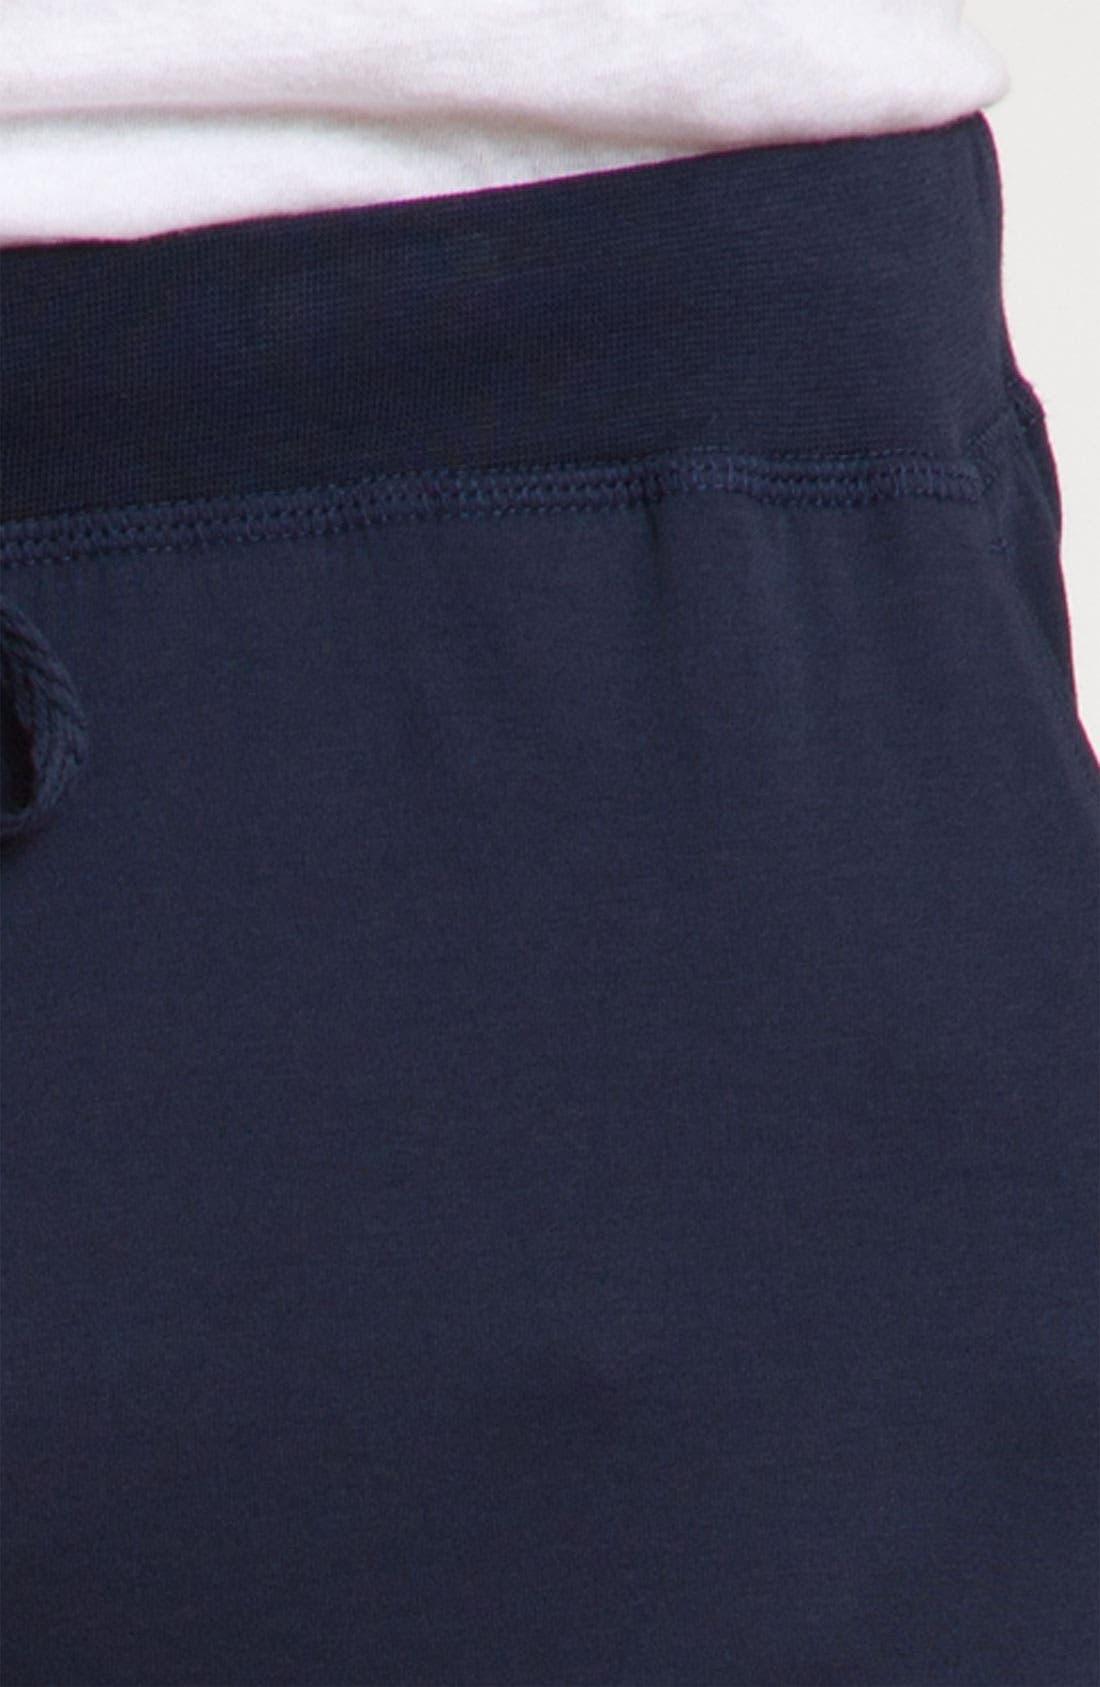 Peruvian Pima Lightweight Cotton Lounge Pants,                             Alternate thumbnail 3, color,                             NAVY